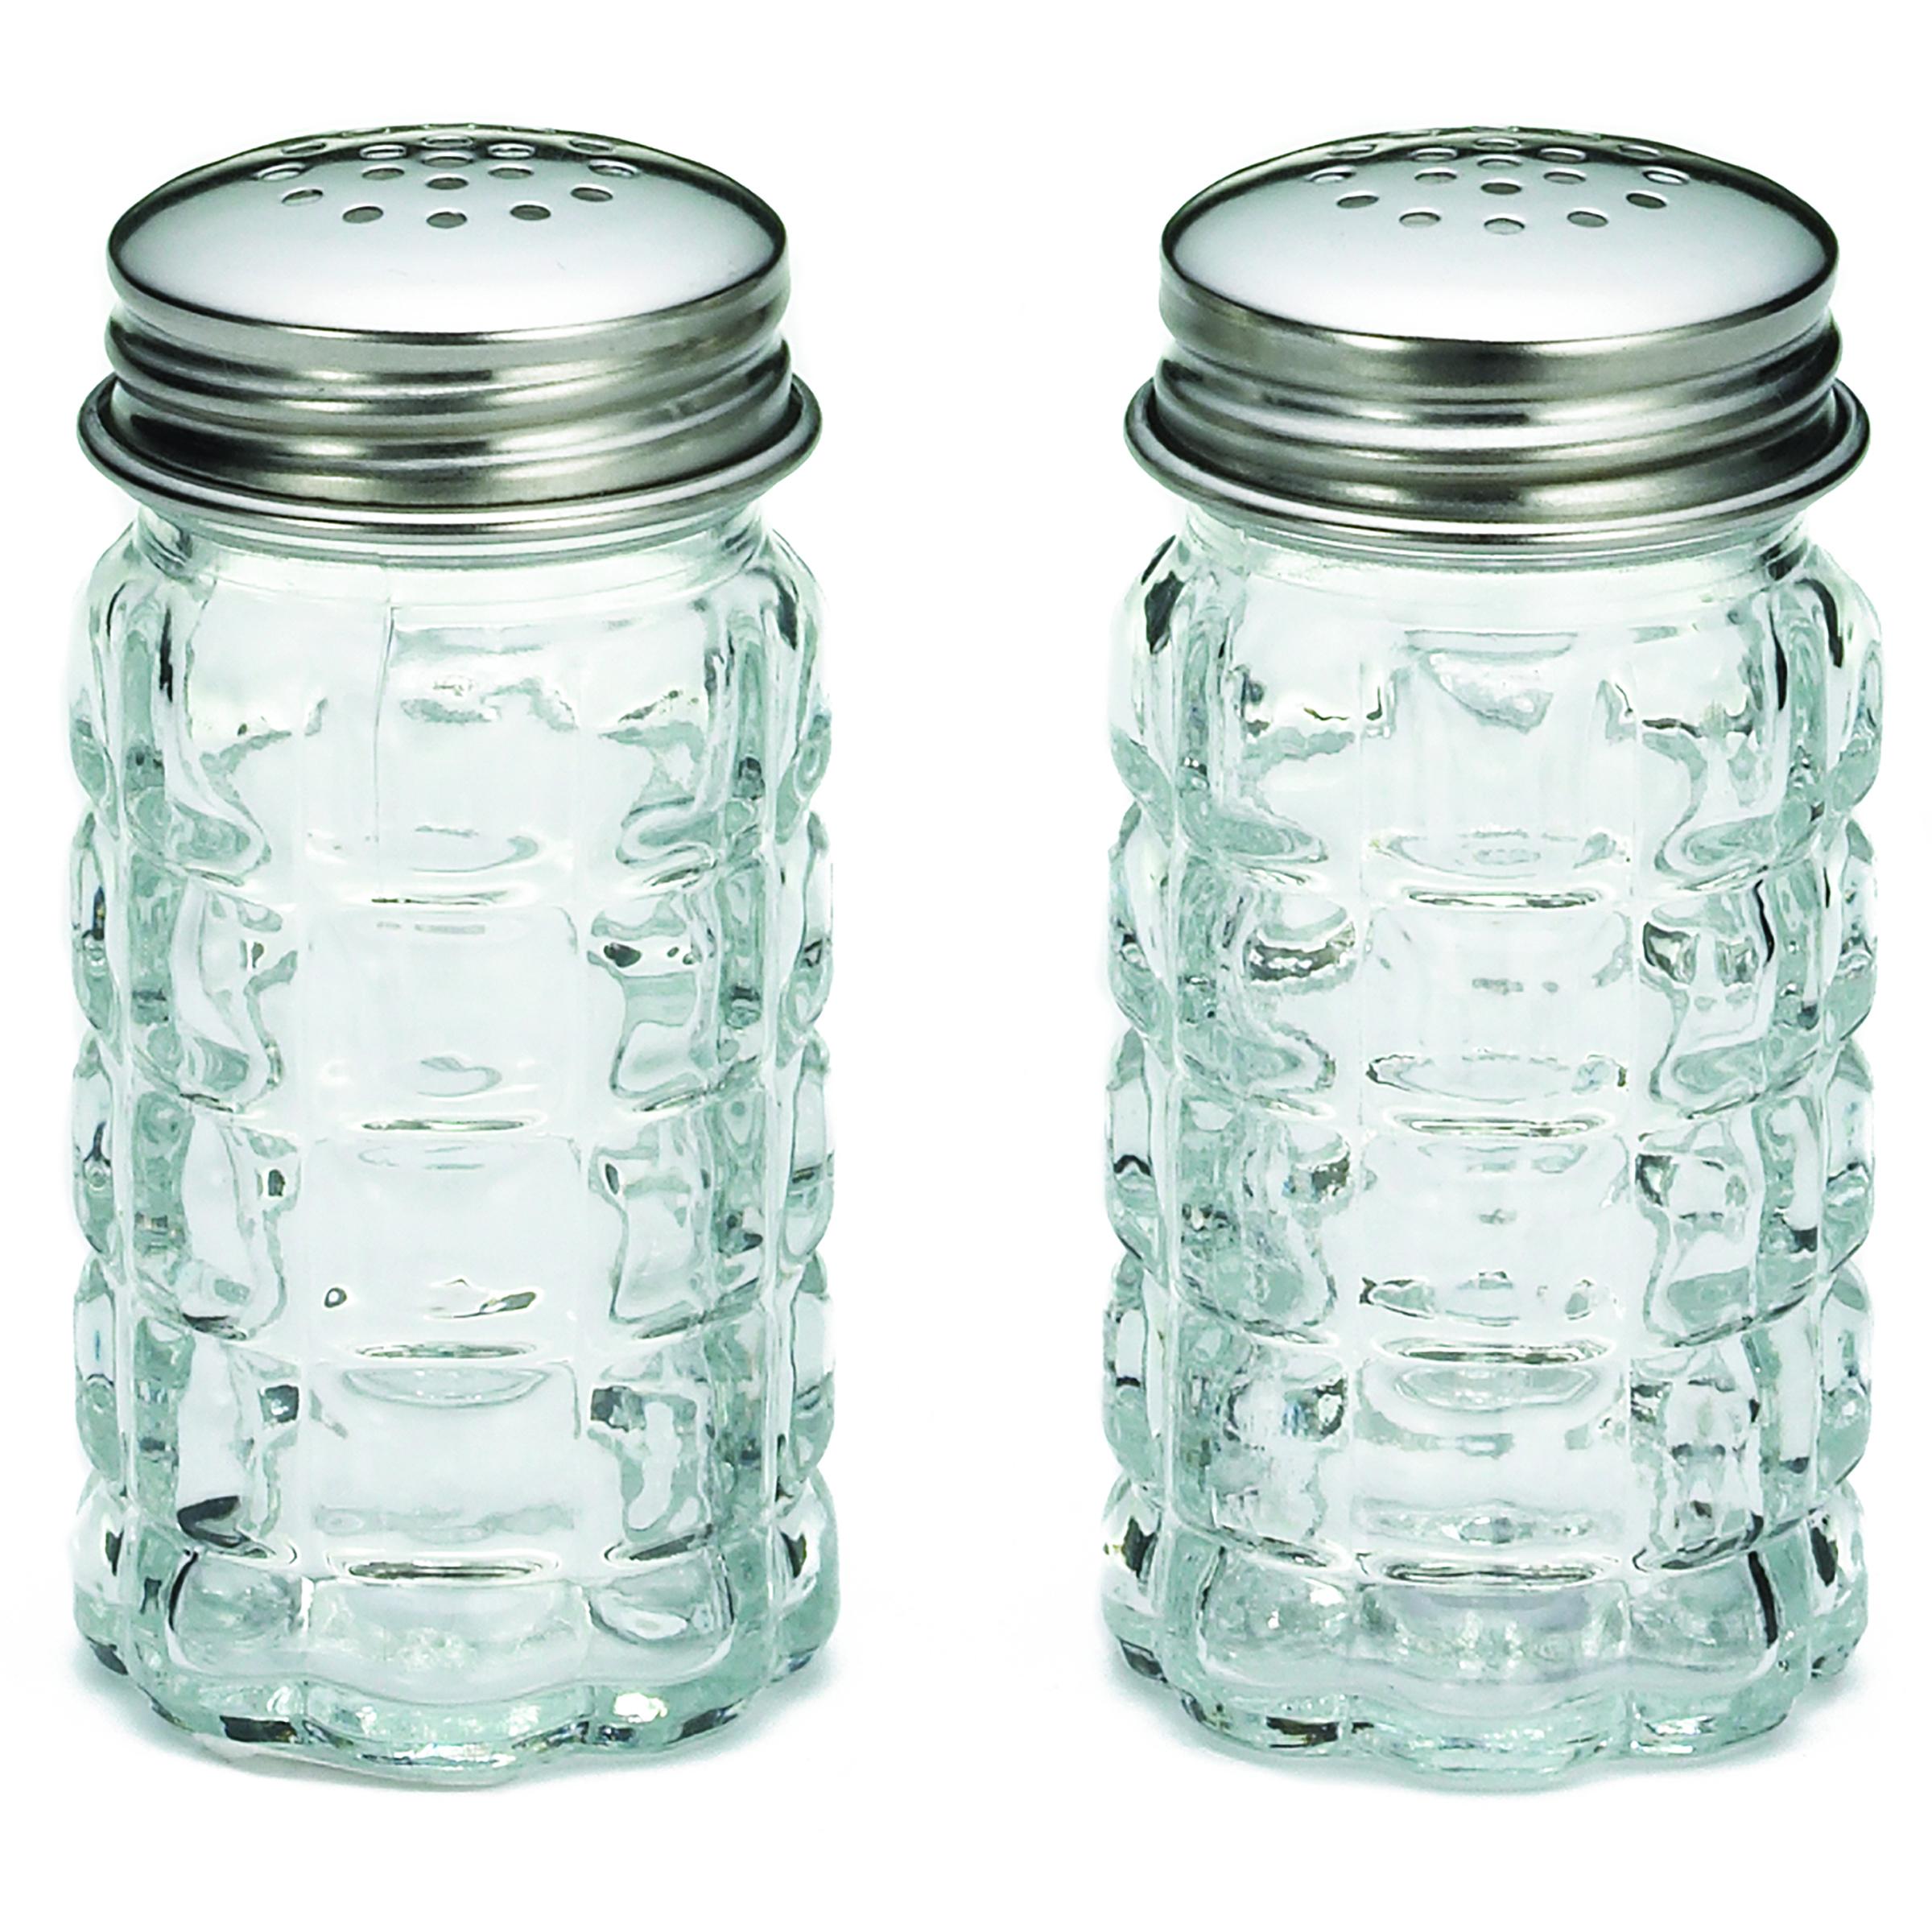 TableCraft Products 163S&P-2 salt / pepper shaker